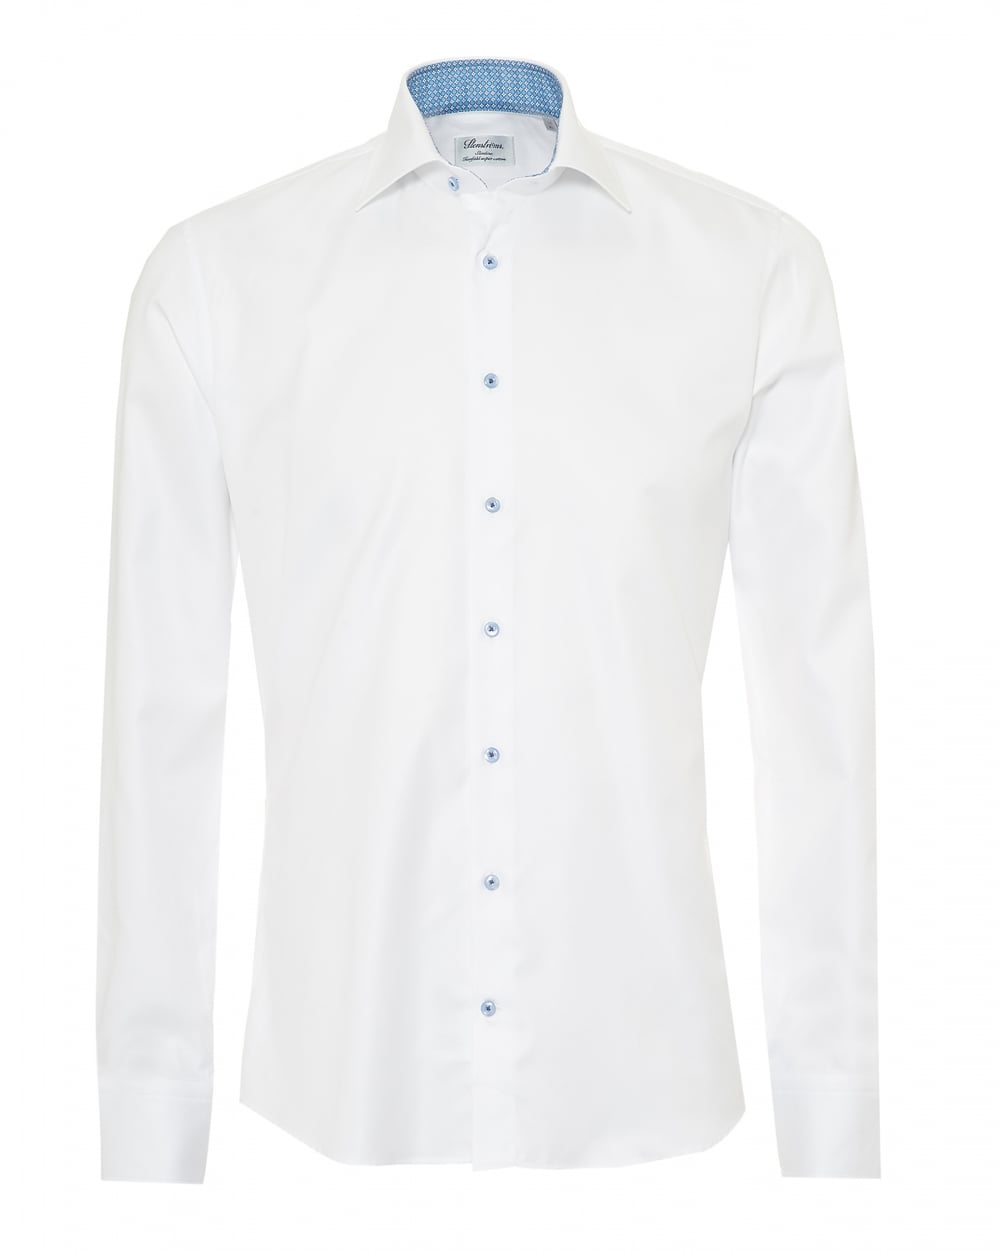 6a73cb38a24404 Stenströms Mens Slimline Shirt, Blue Geometric Print Trim White Shirt